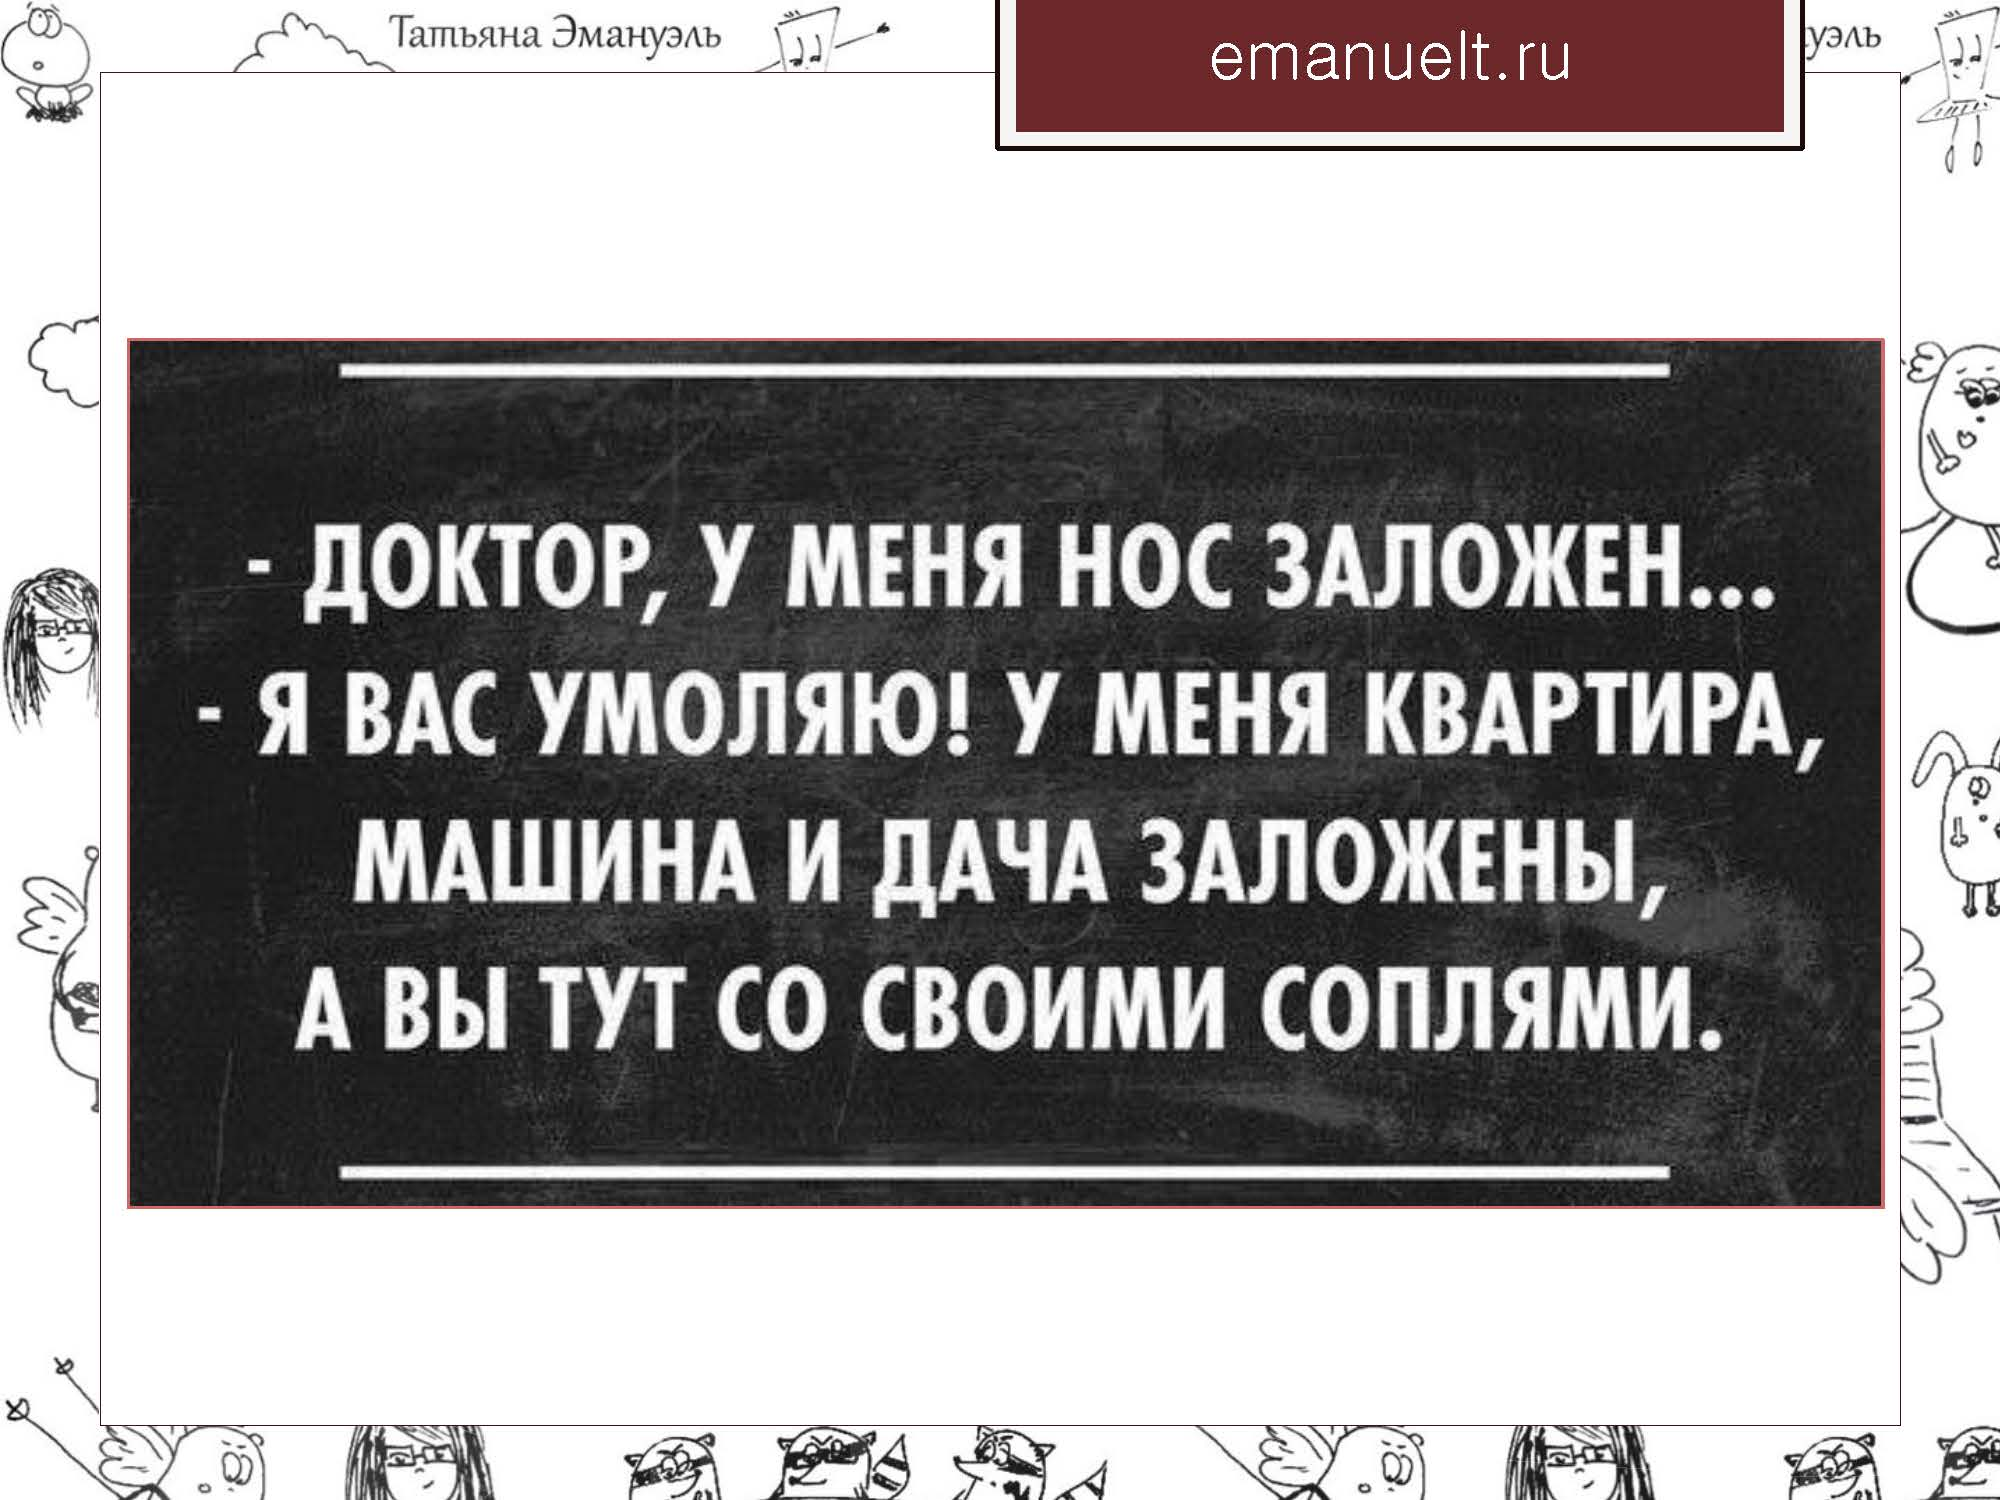 06 февраля эмануэль_Страница_068